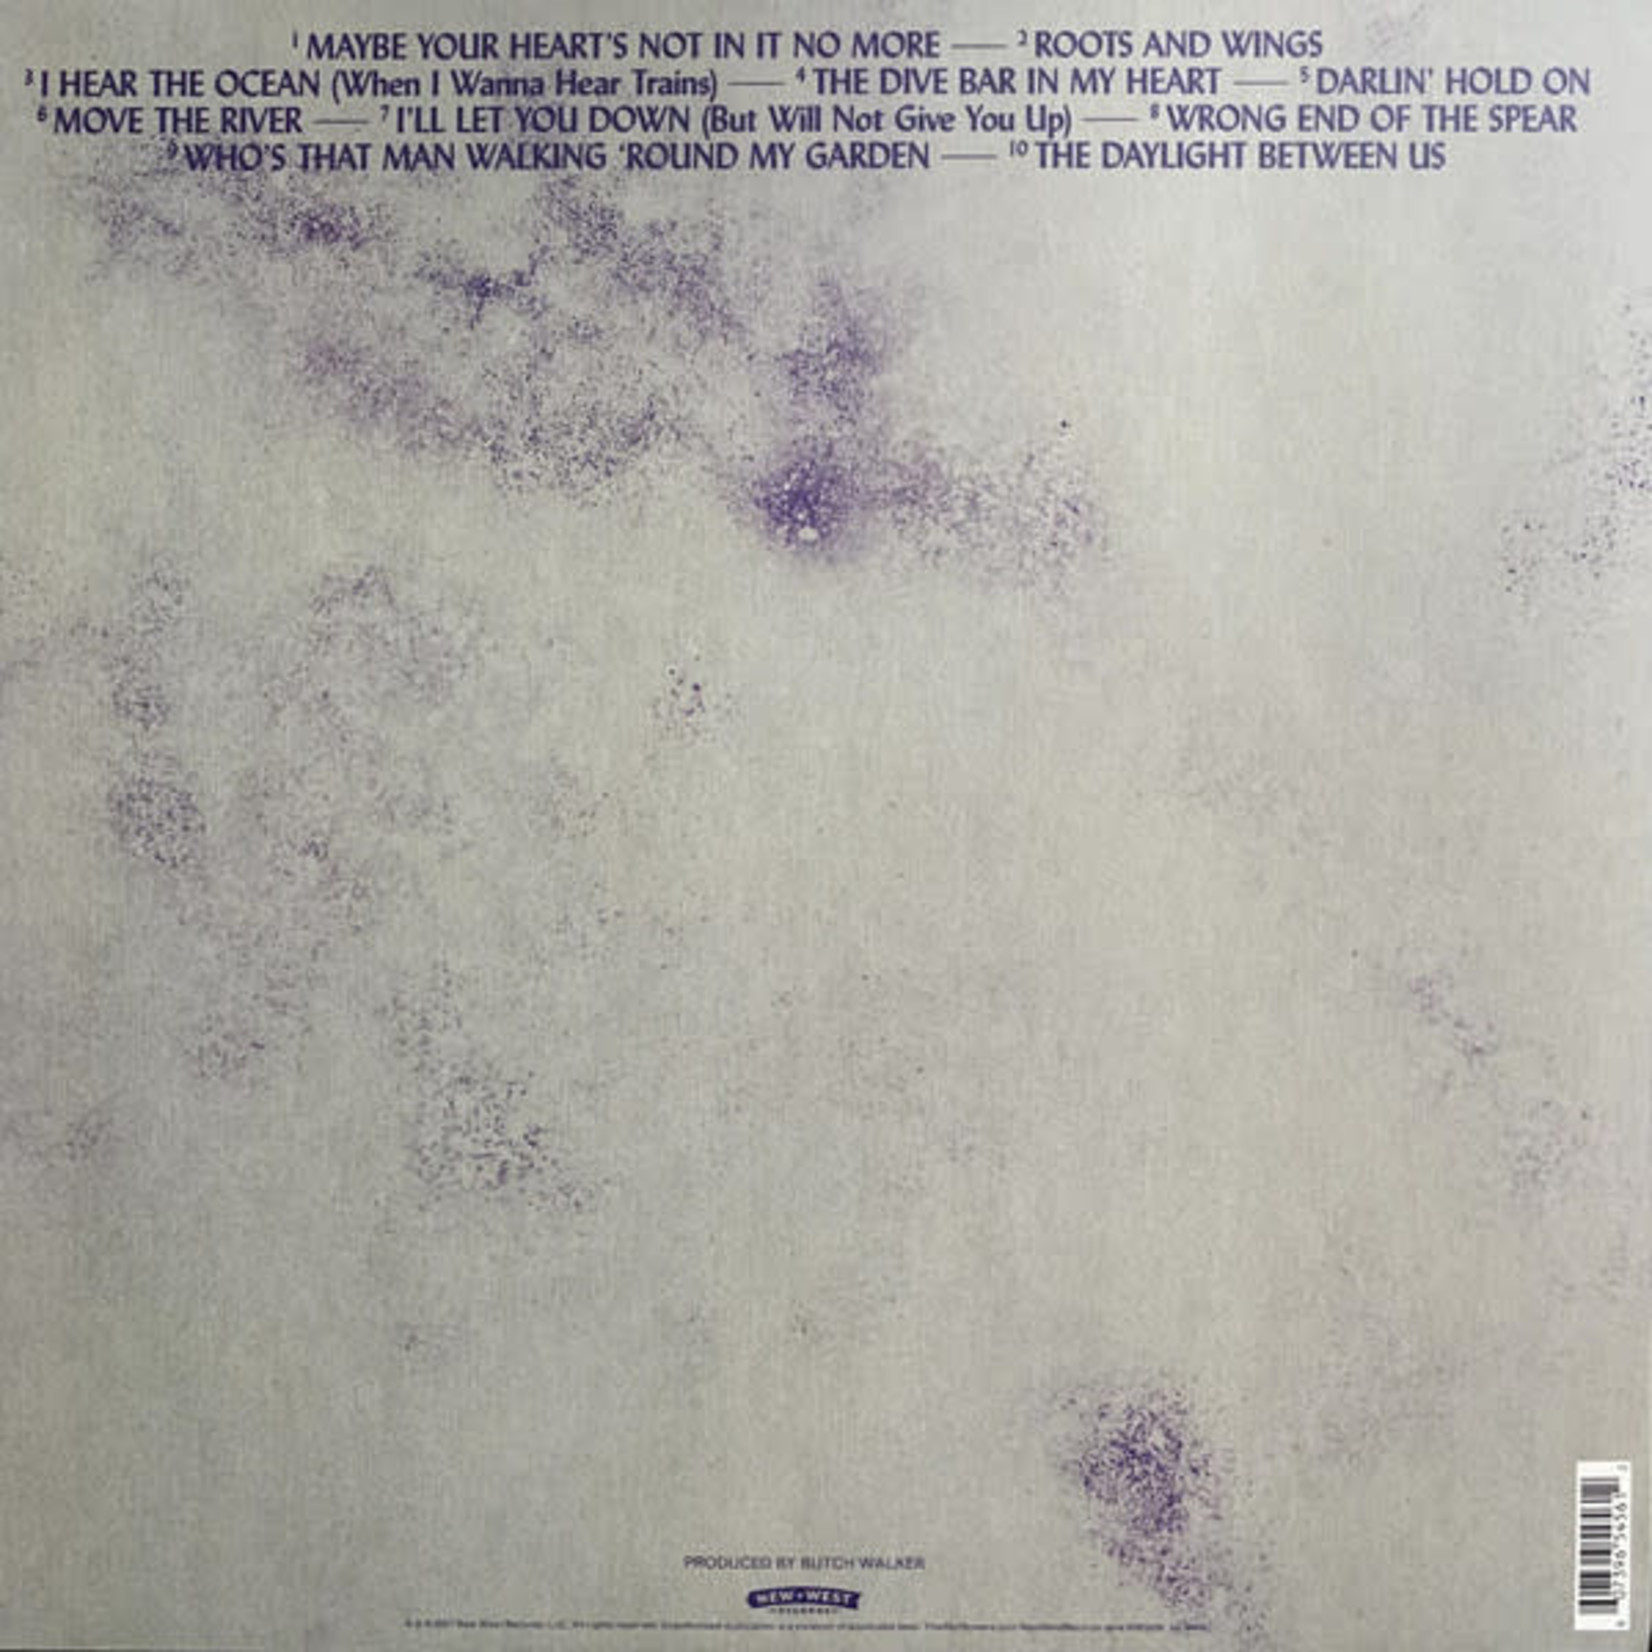 THE WALLFLOWERS EXIT WOUNDS (INDIE EXCLUSIVE, PURPLE VINYL)